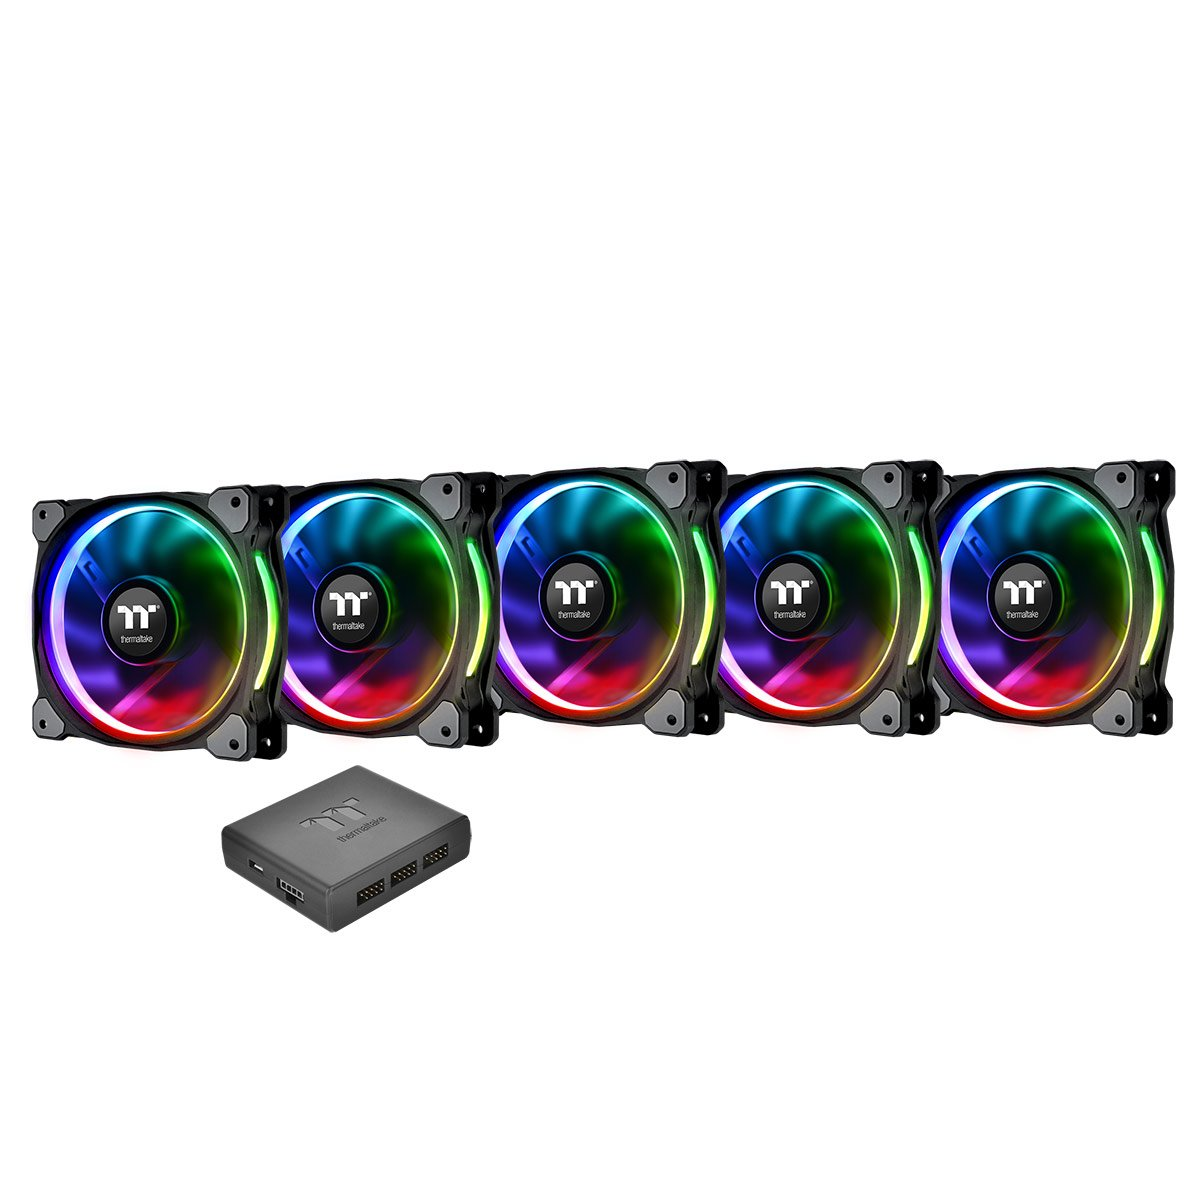 Thermaltake CL-F054-PL12SW-A Riing Plus 12 LED RGB Radiator Fan - Black (Pack of 5)